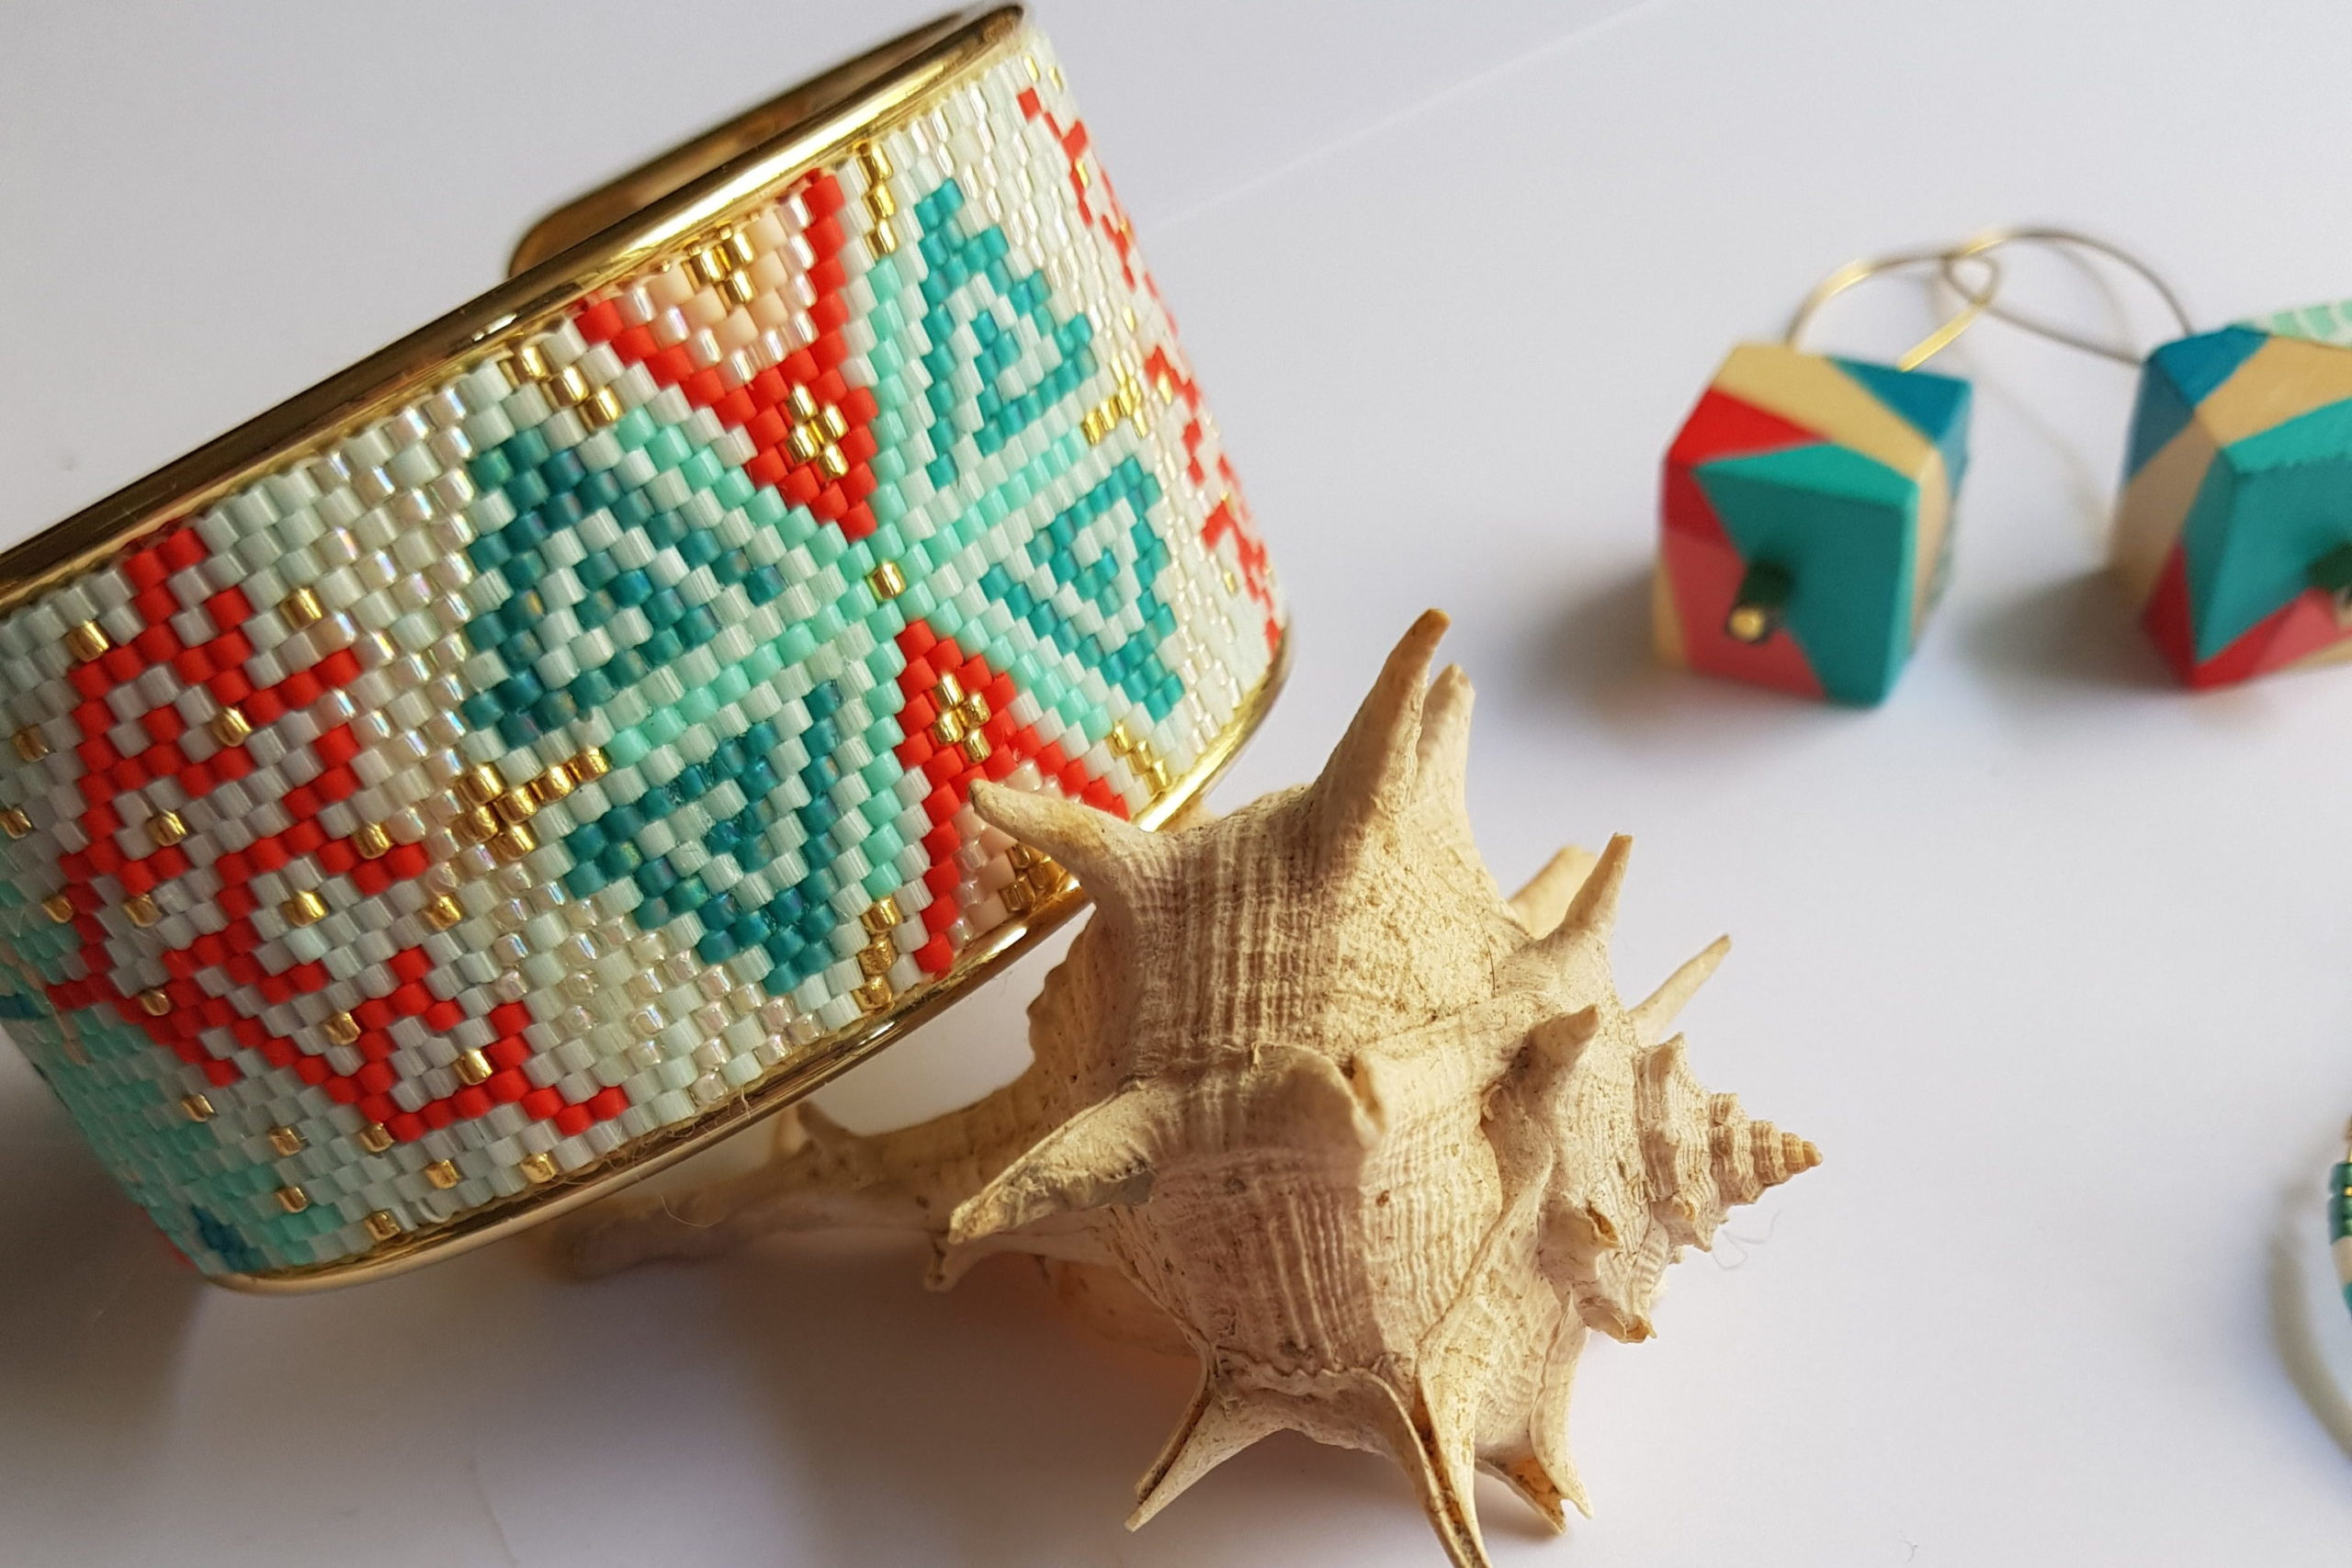 Gebetnout bijoux fantaisie lyon mode tendance bijouterie femme Oullins artisan manchette corail